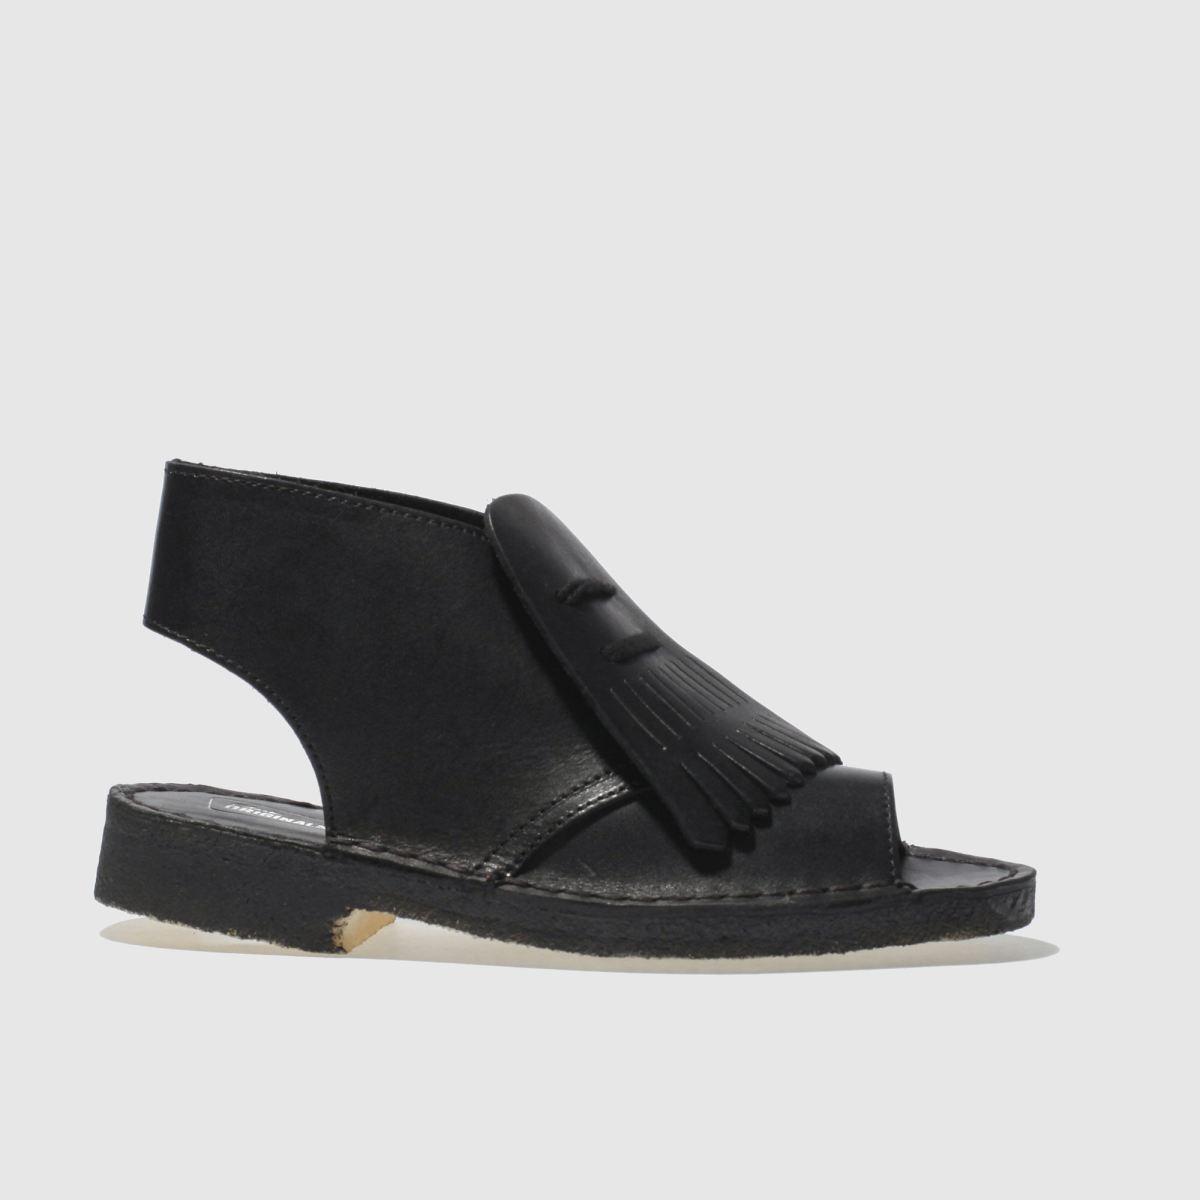 clarks originals black desert kiltie boots